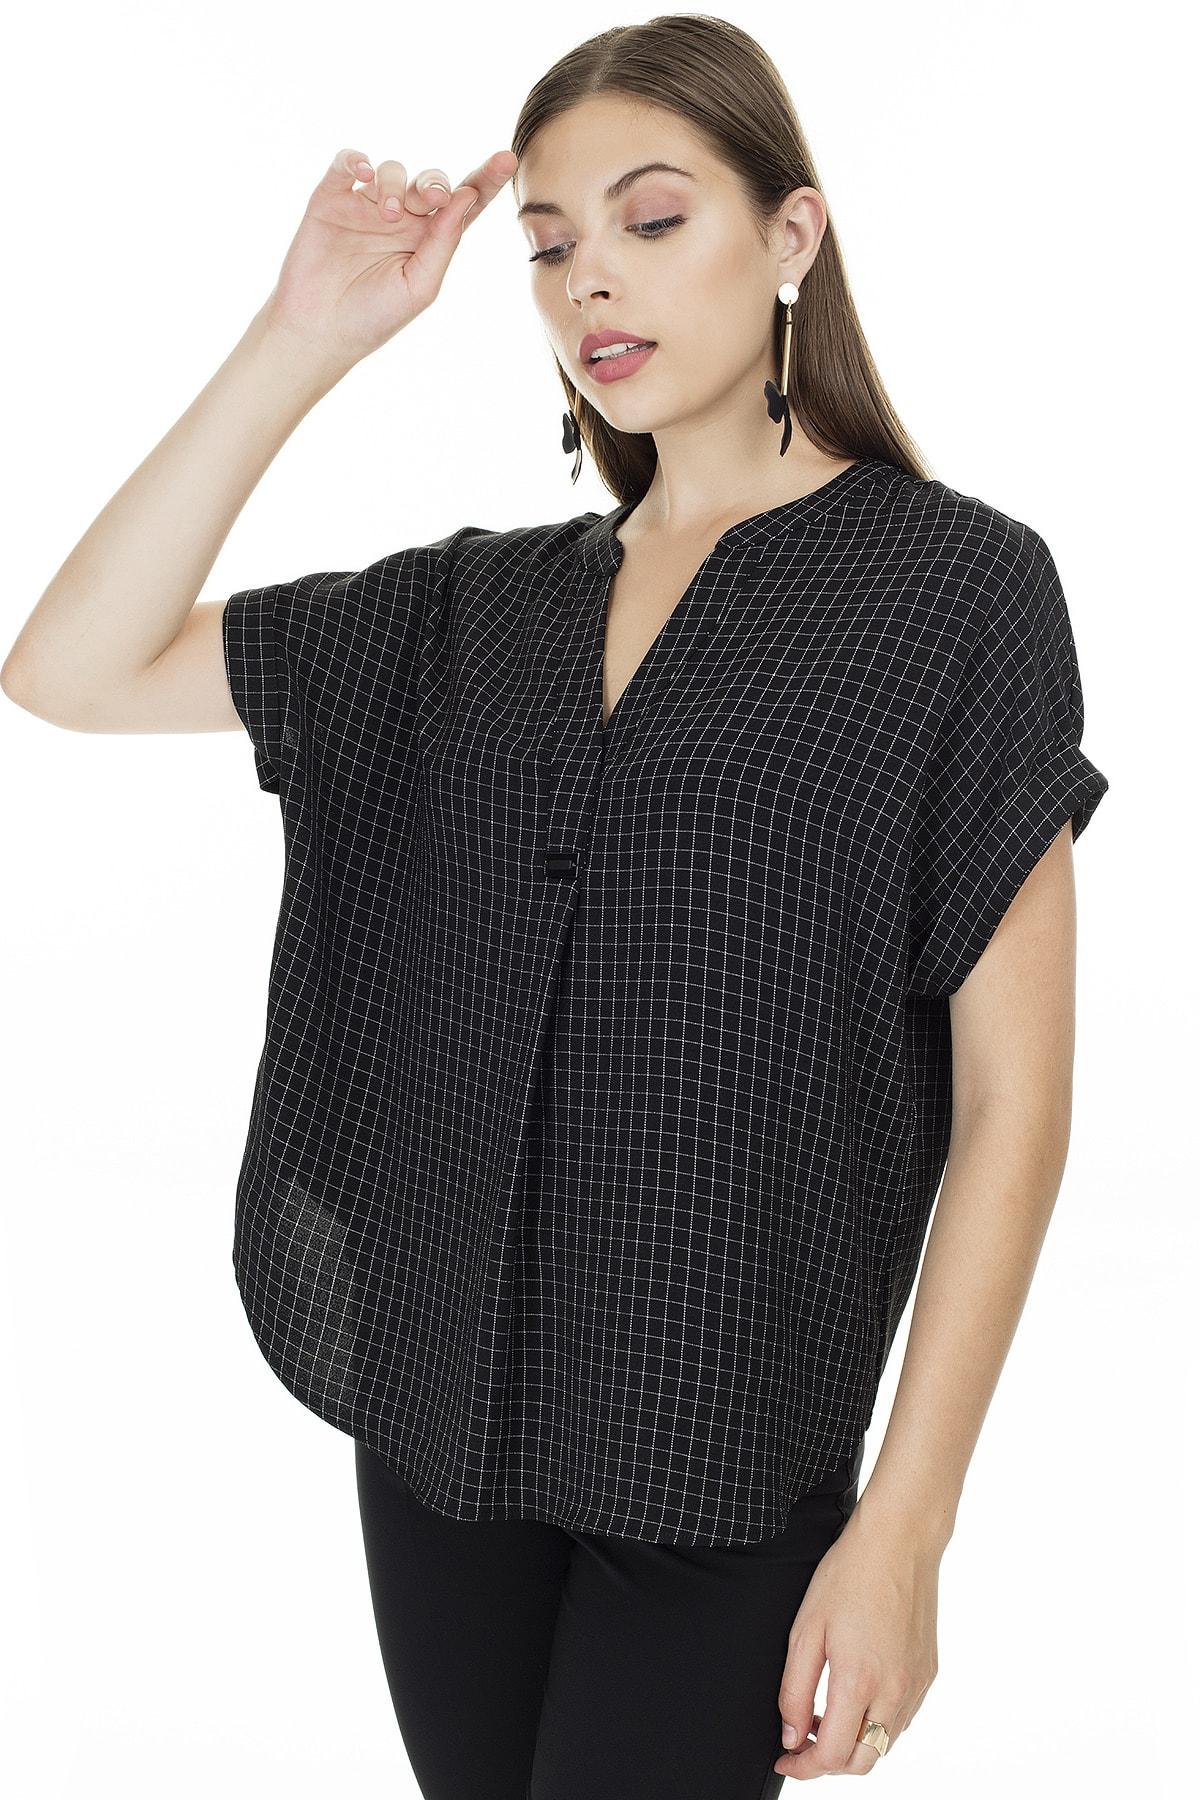 Ayhan Siyah-Ekru Kareli V Yaka Bluz Kadın Bluz 04681405 3